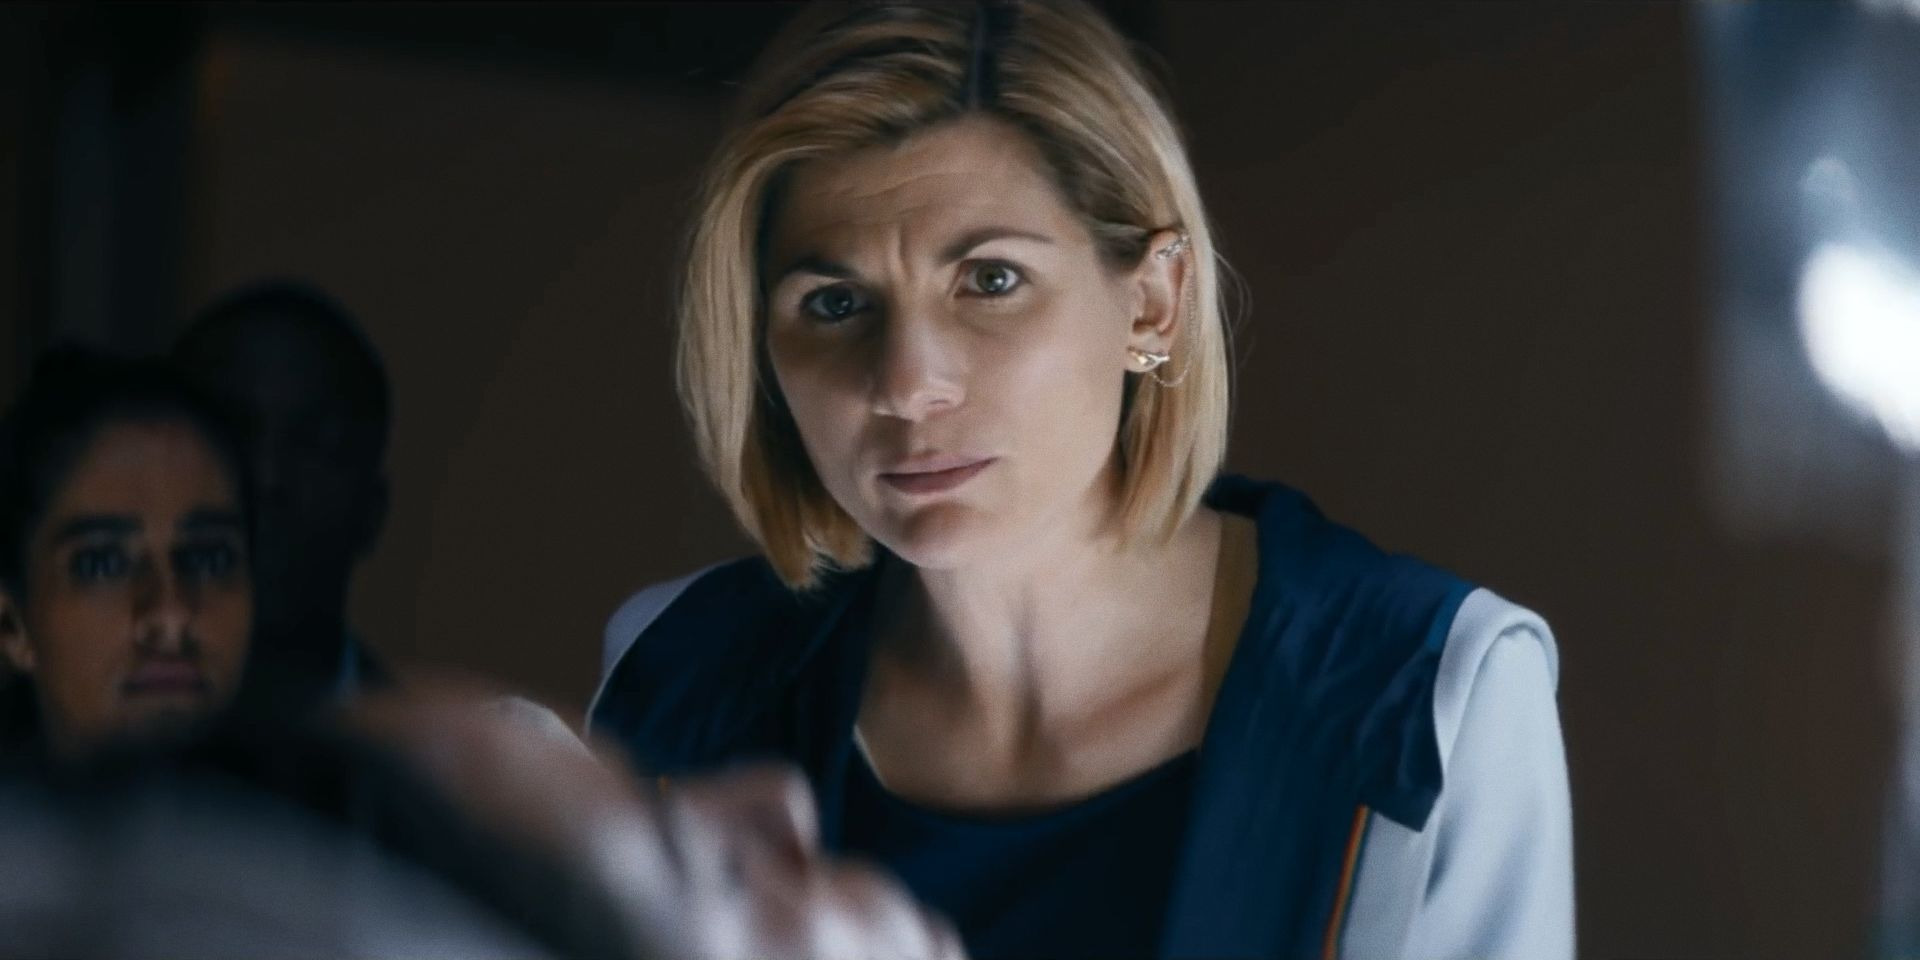 Doctor Who — s12e01 — Spyfall, Part 1